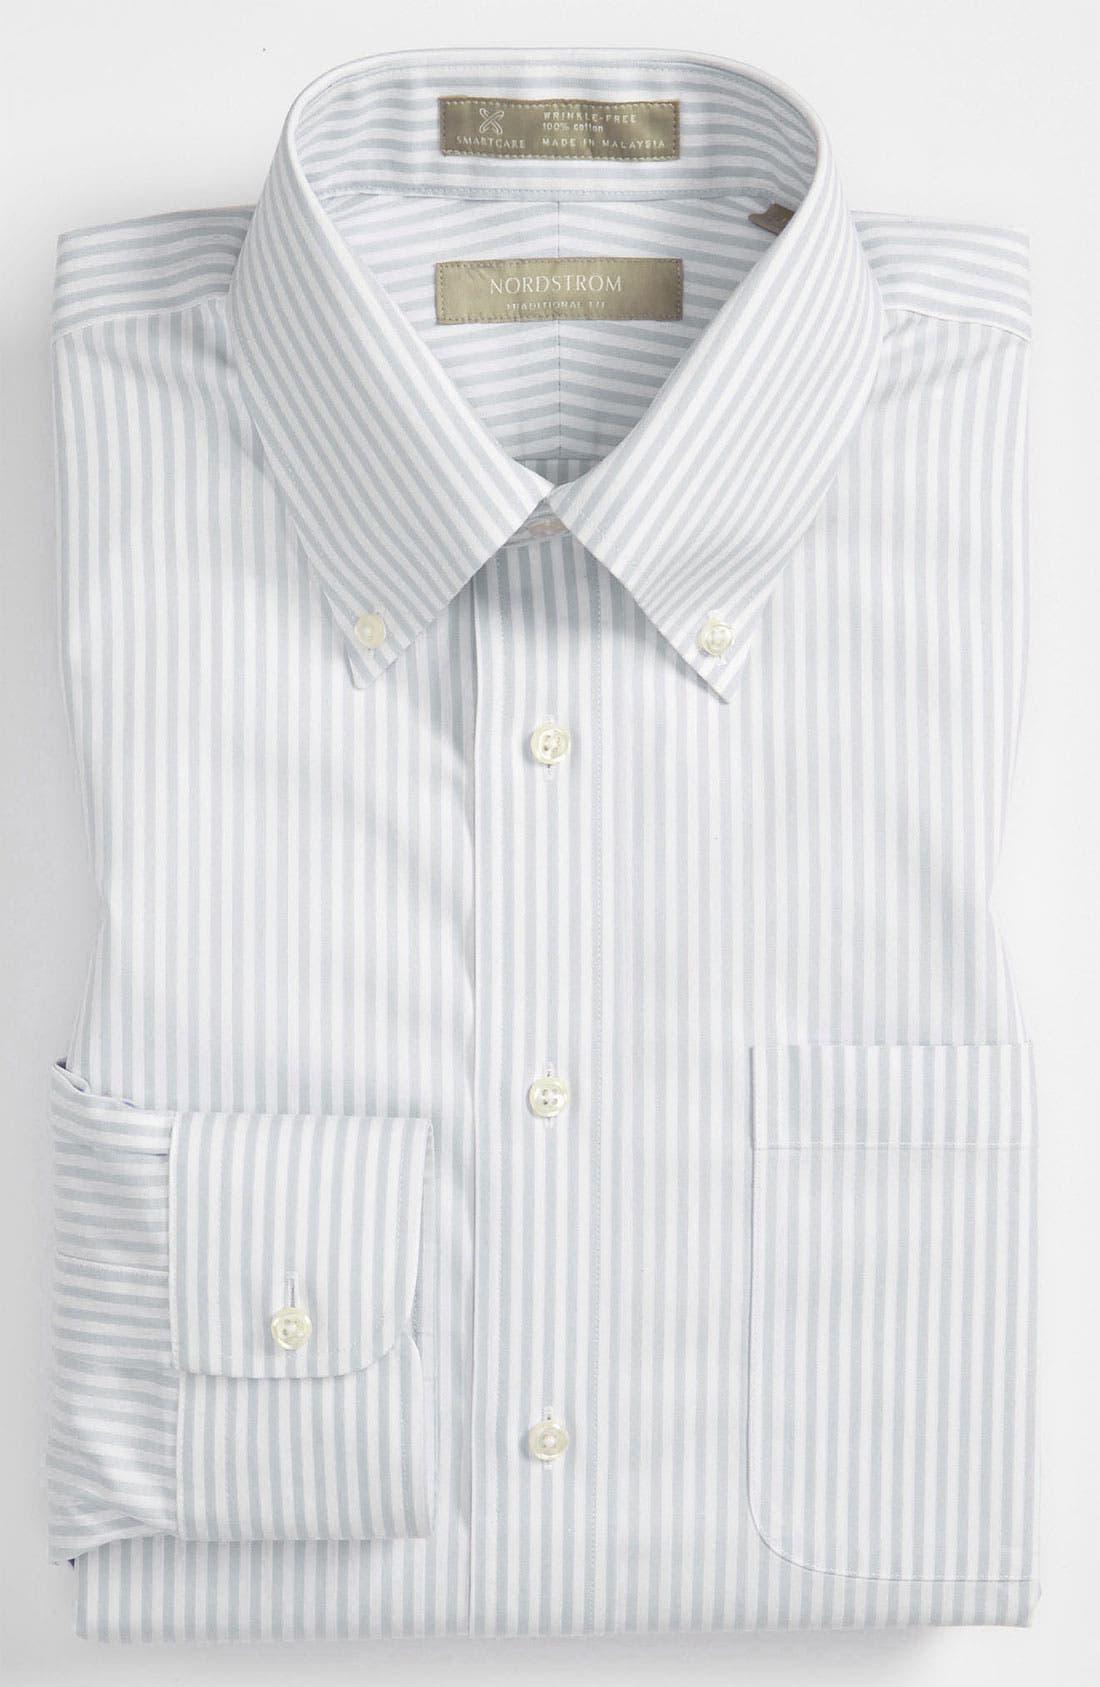 NORDSTROM MEN'S SHOP Smartcare<sup>™</sup> Traditional Fit Stripe Dress Shirt, Main, color, 020